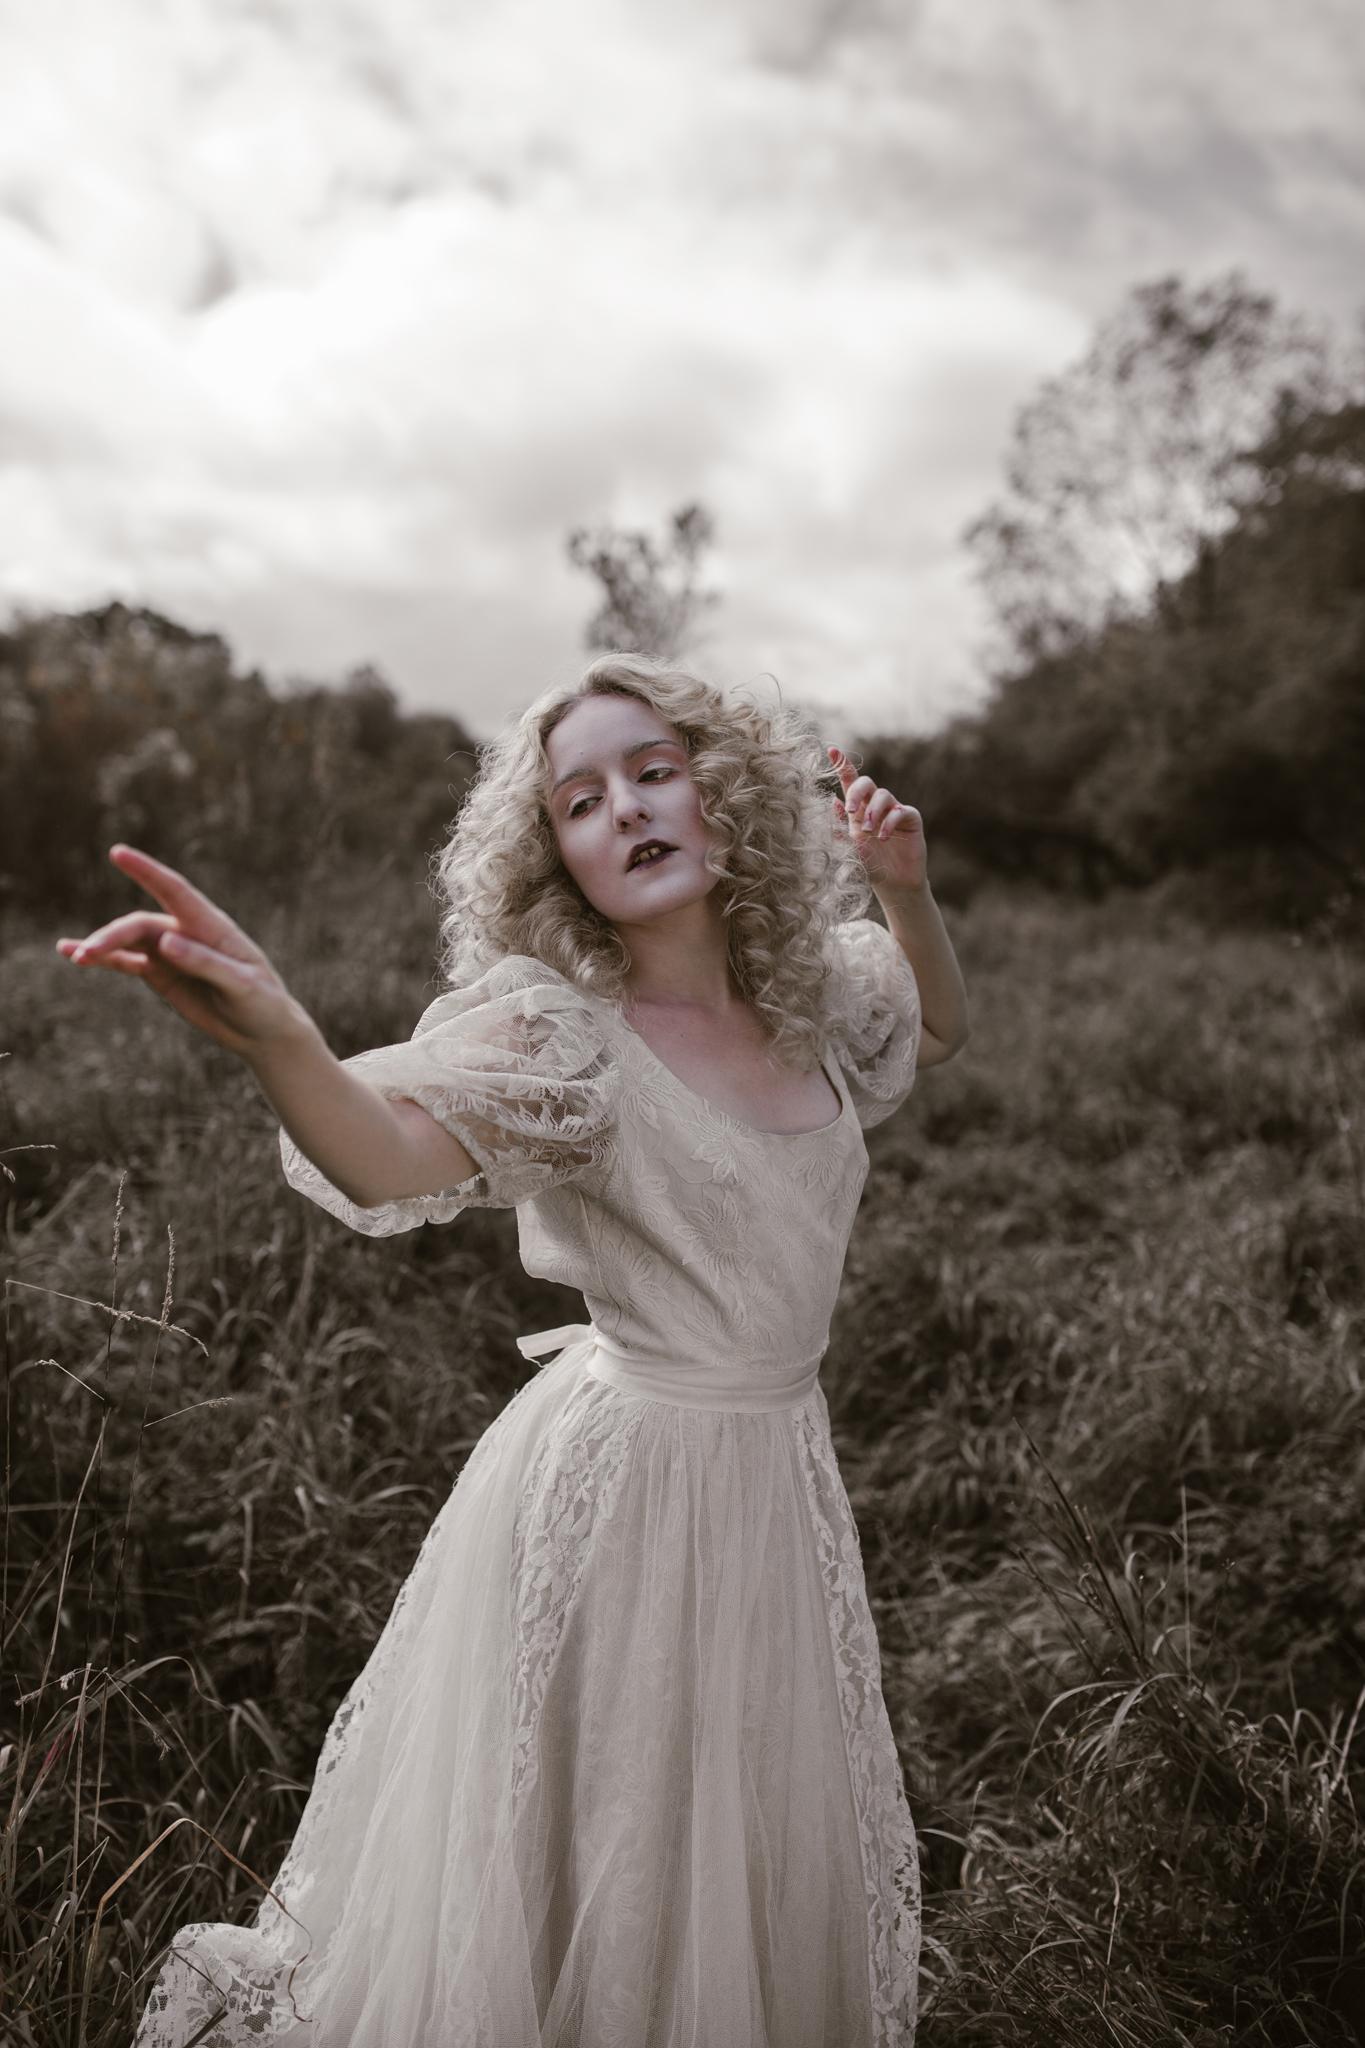 pale-witch-057fb.jpg